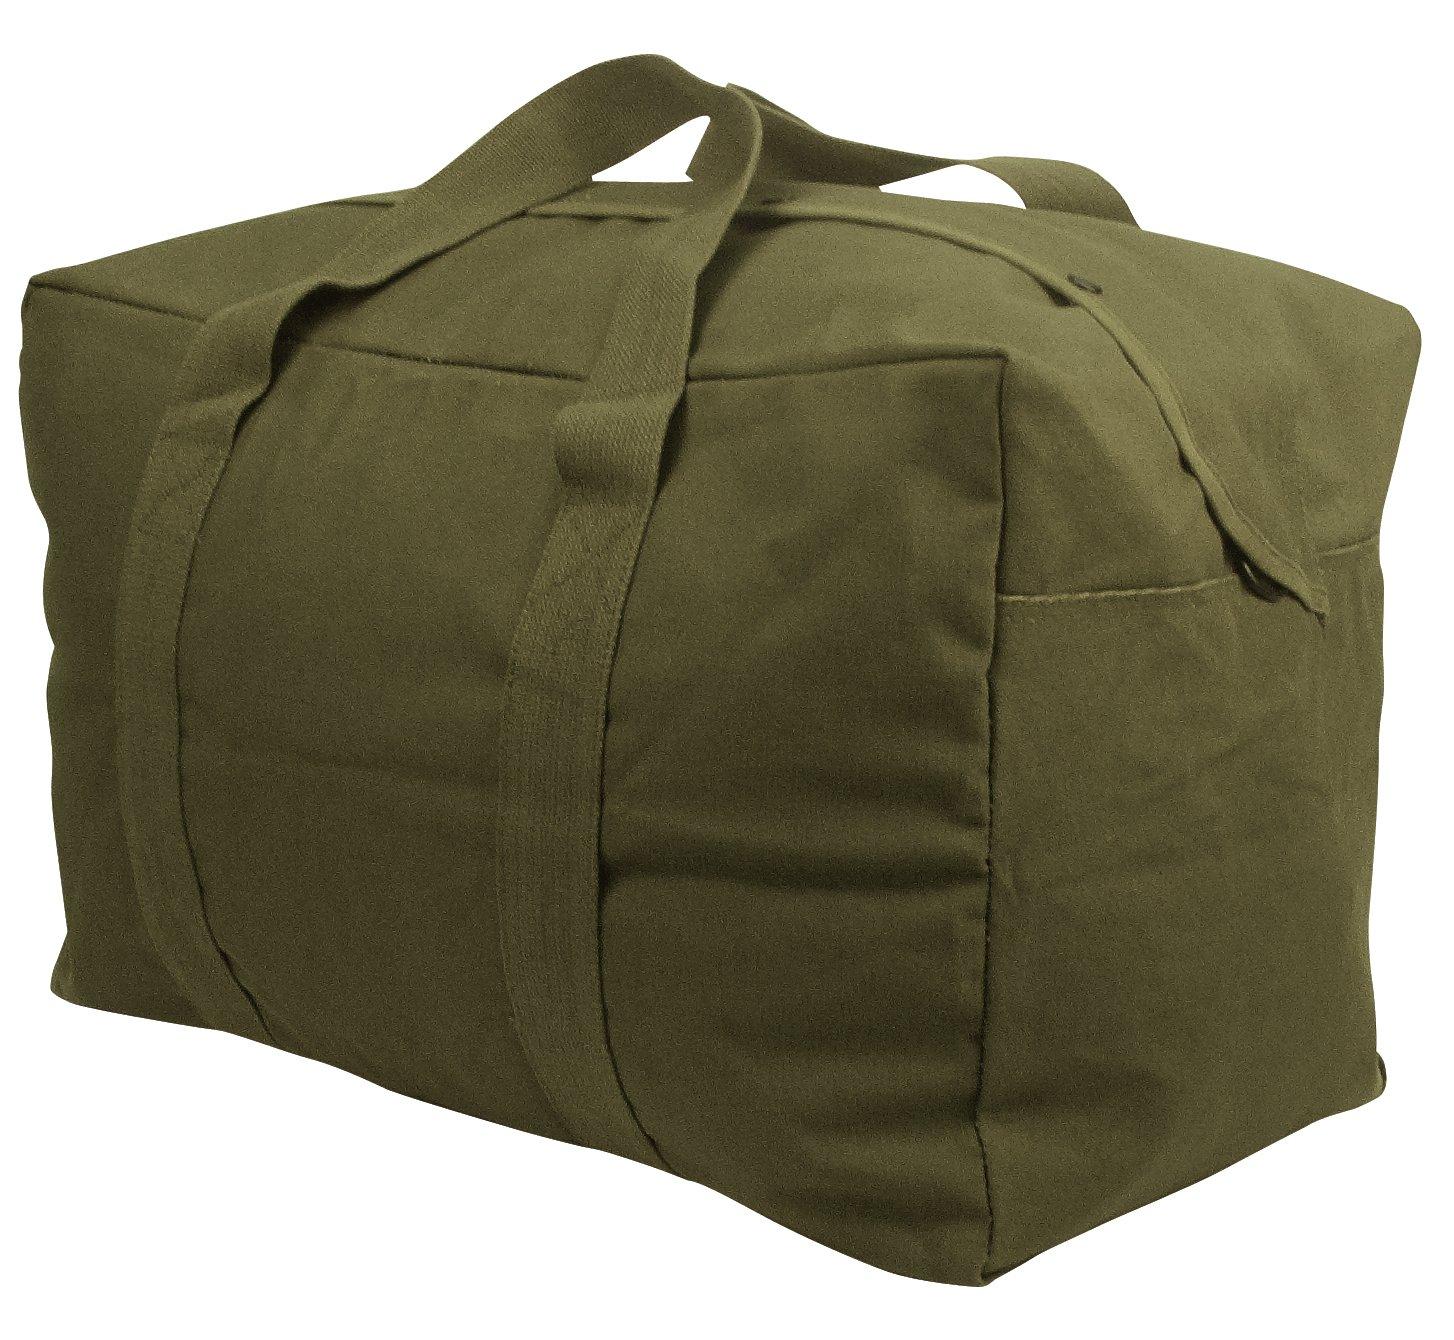 Rothco Canvas Parachute Cargo Bag, Olive Drab